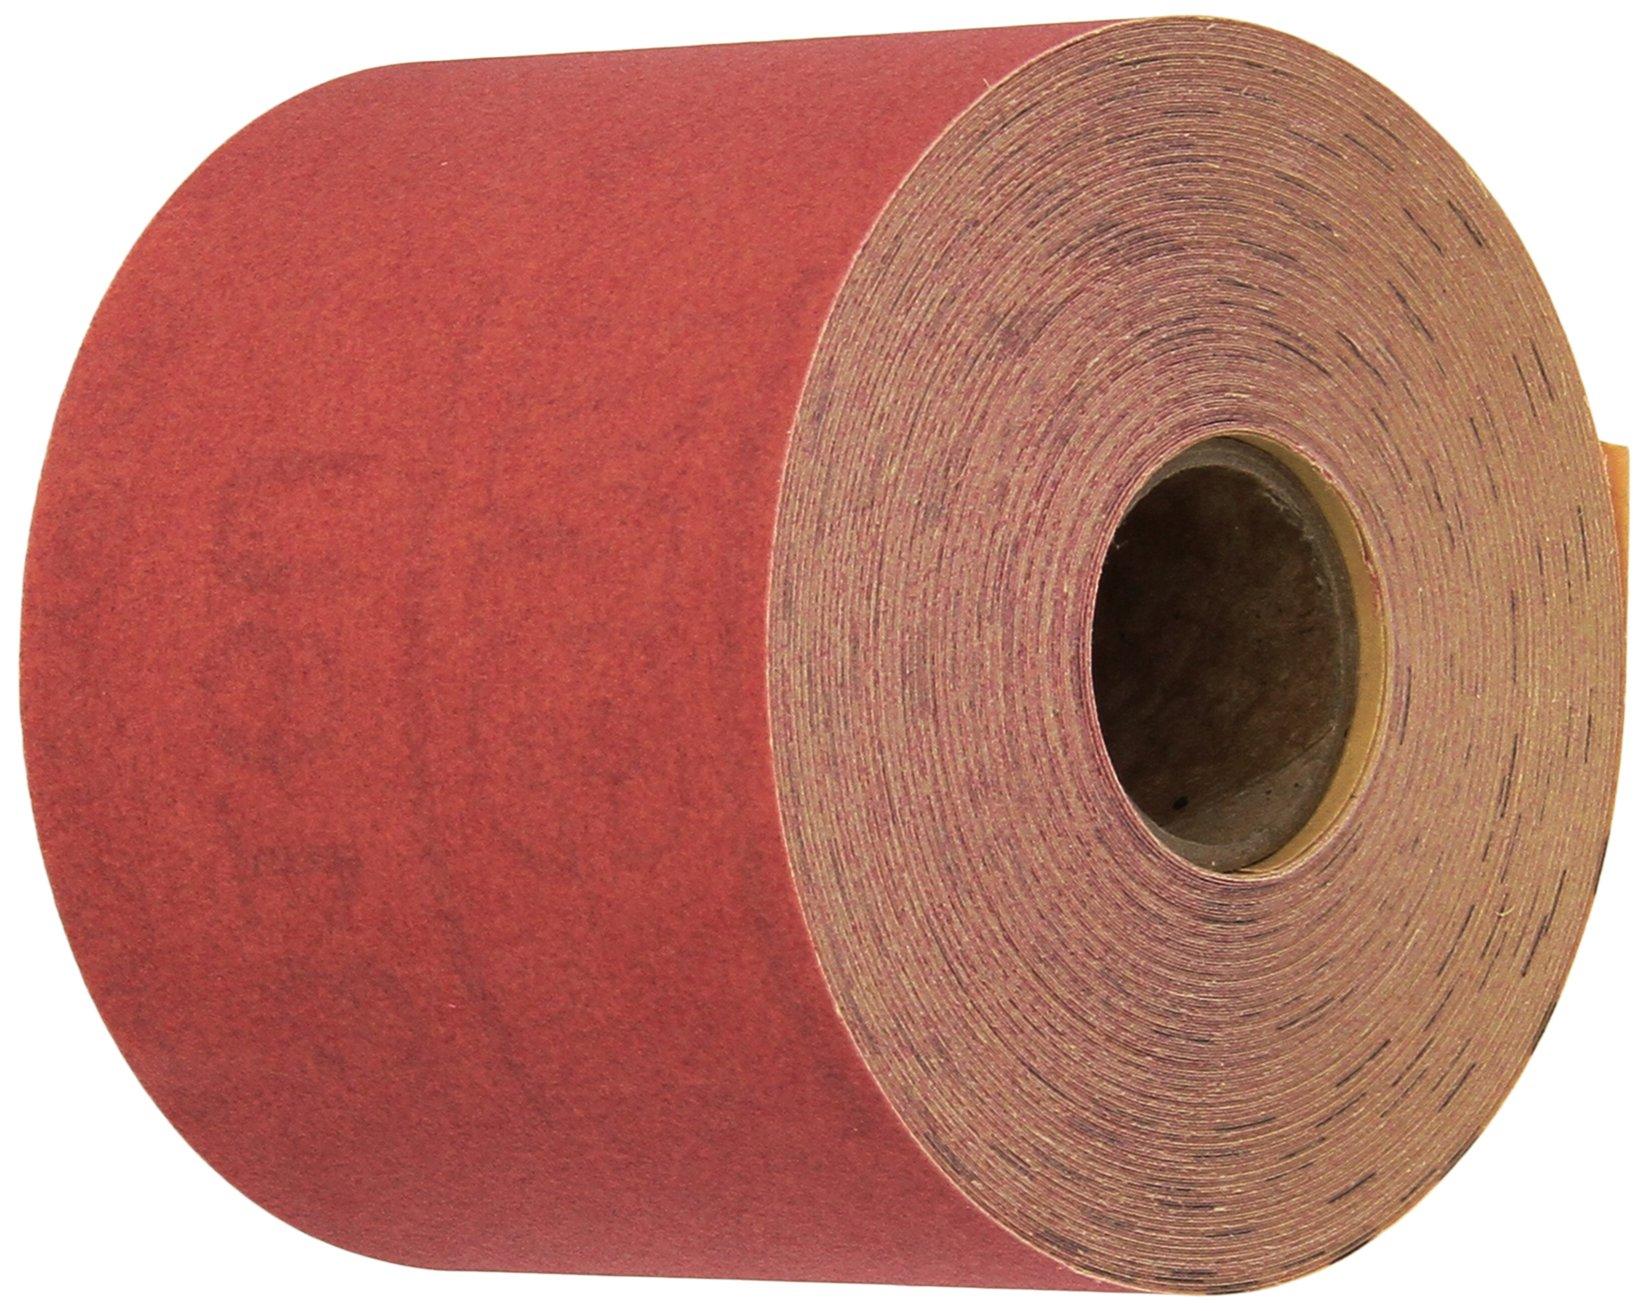 3M 01682 Stikit Red 2-3/4'' x 25 Yard P320 Grit Abrasive Sheet Roll by 3M